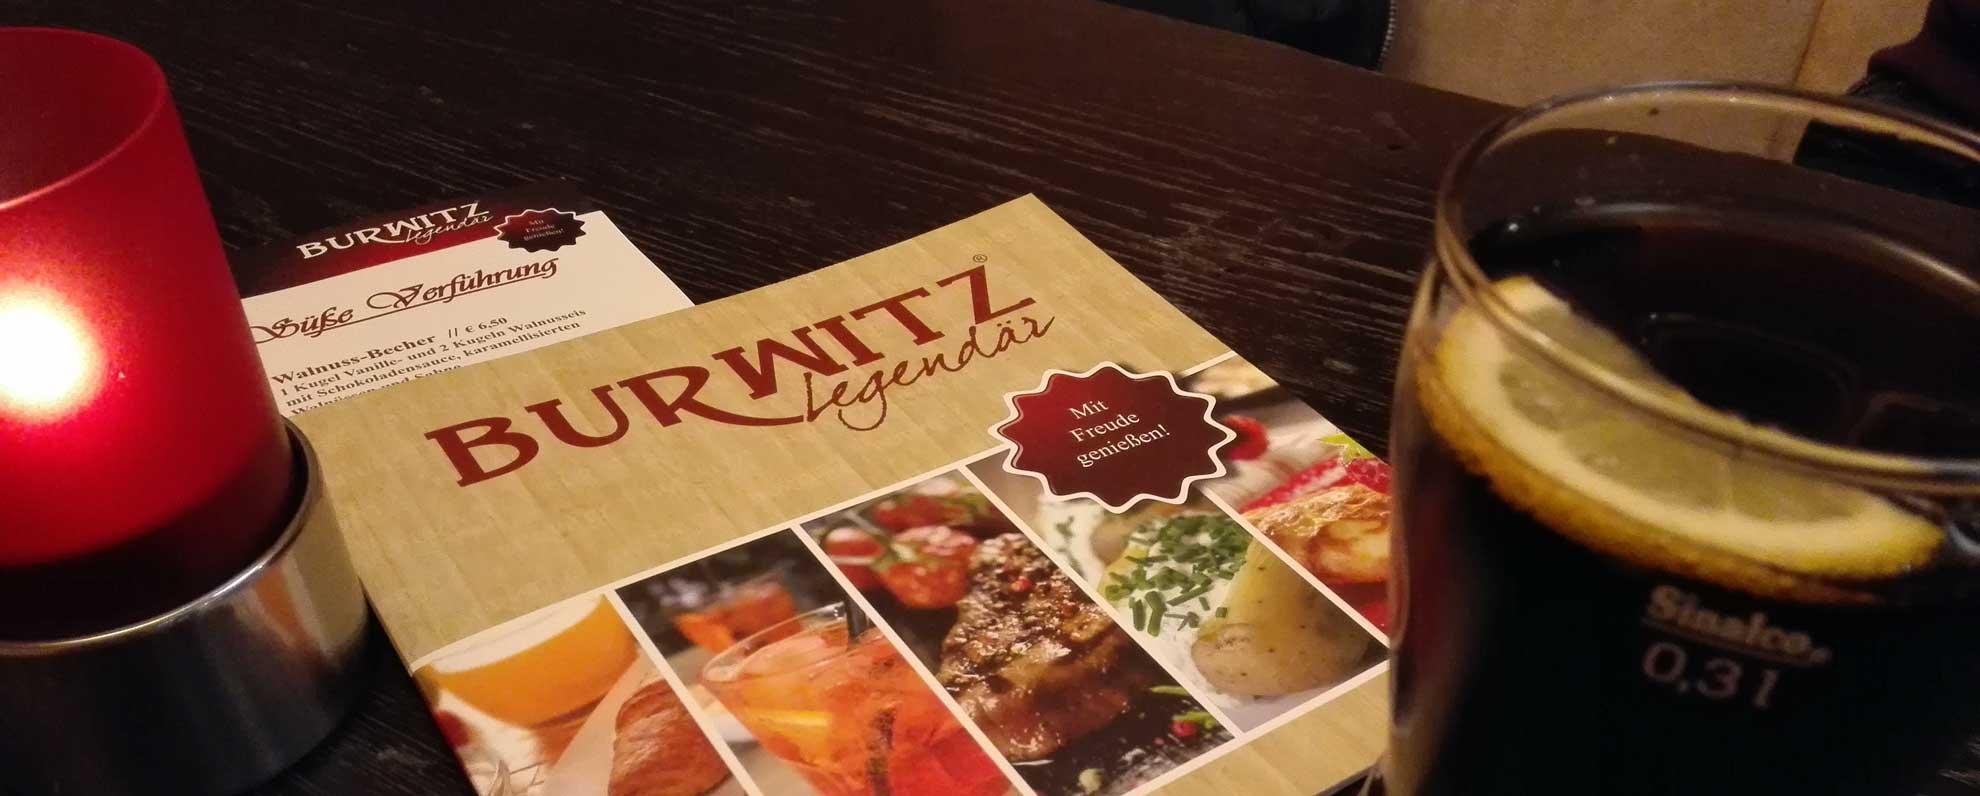 Burwitz legendär Rostock Restaurant Tipp